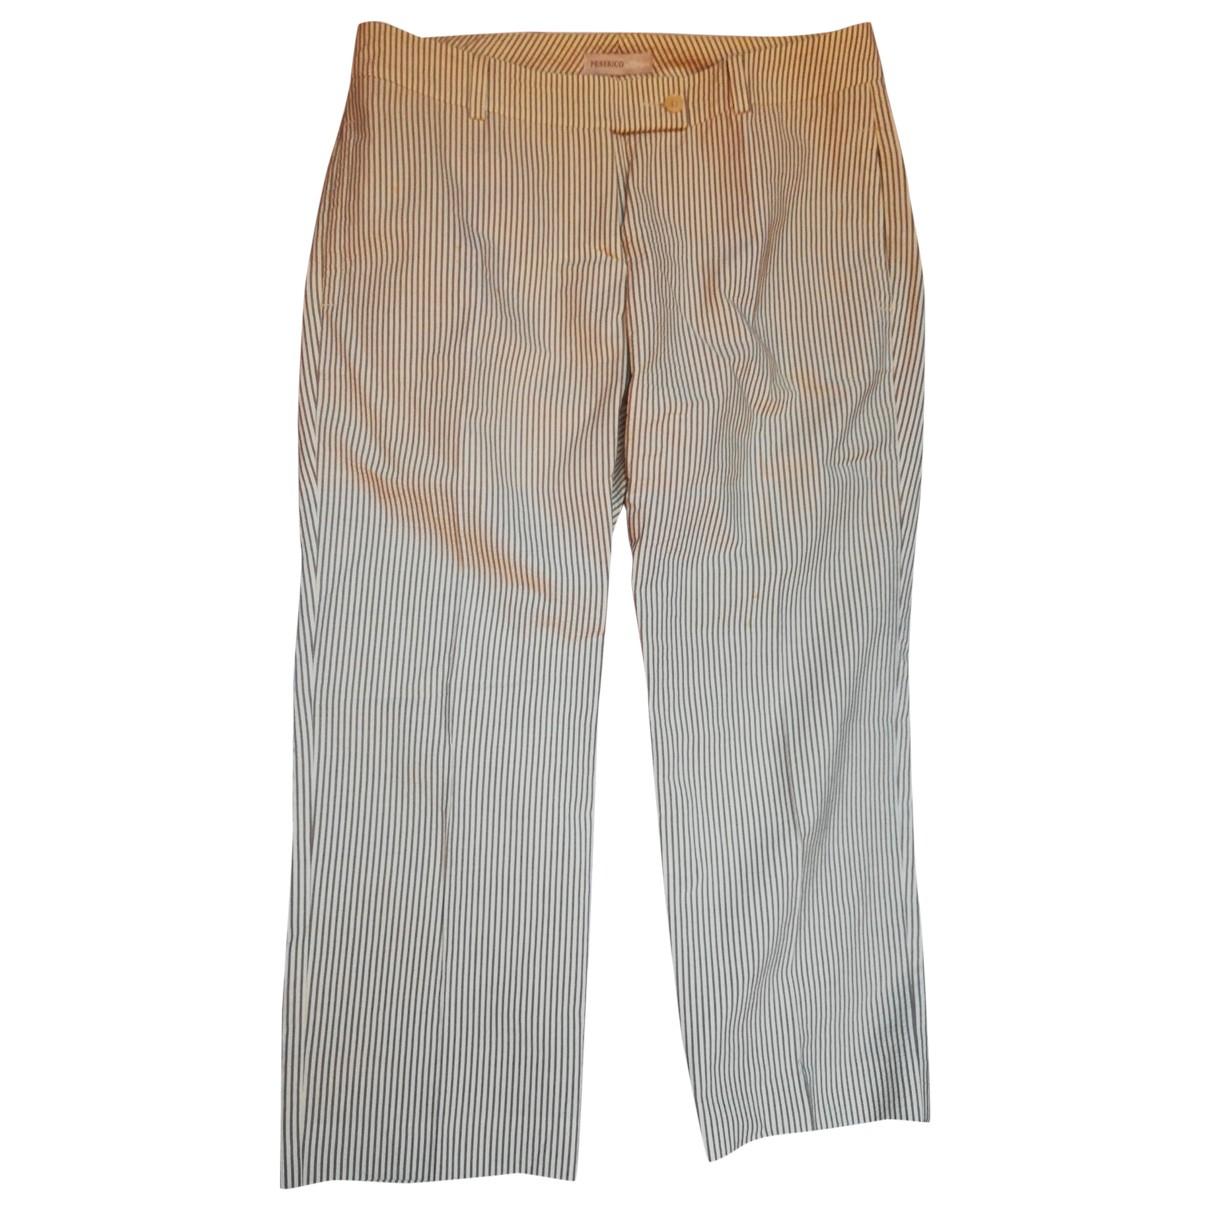 Pantalon en Algodon Crudo Peserico